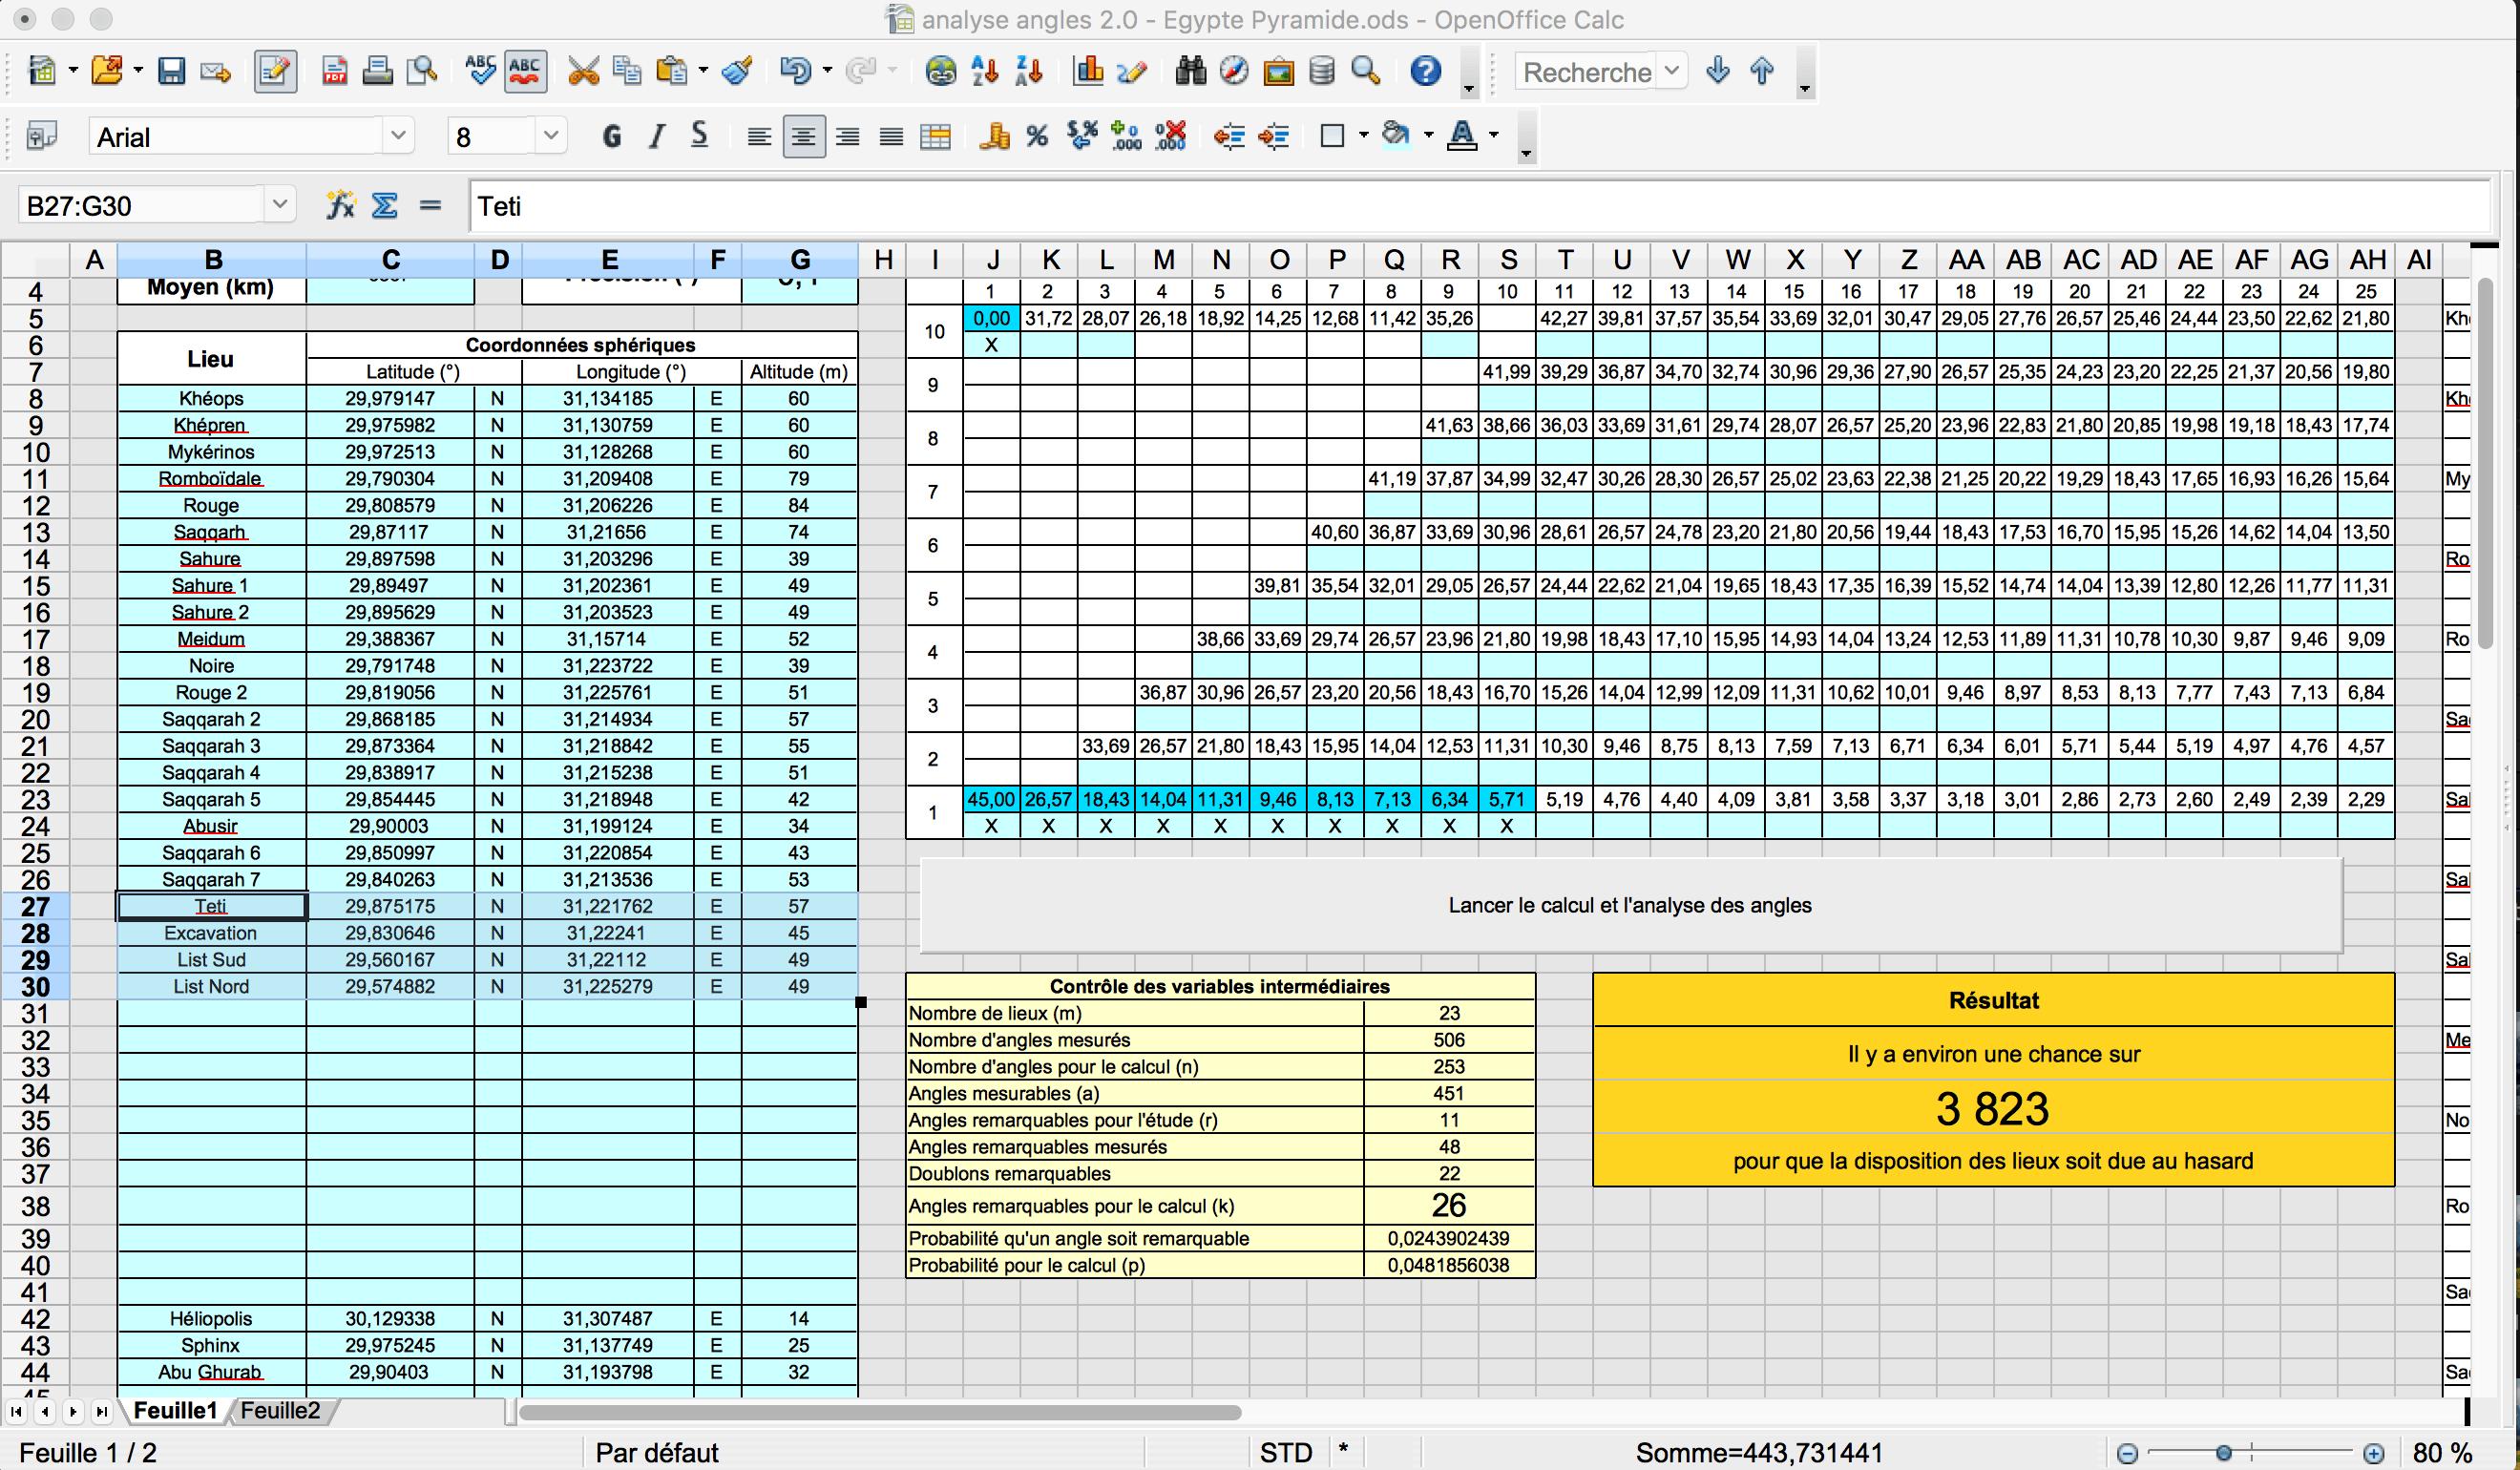 2017-11-13 07:57:44